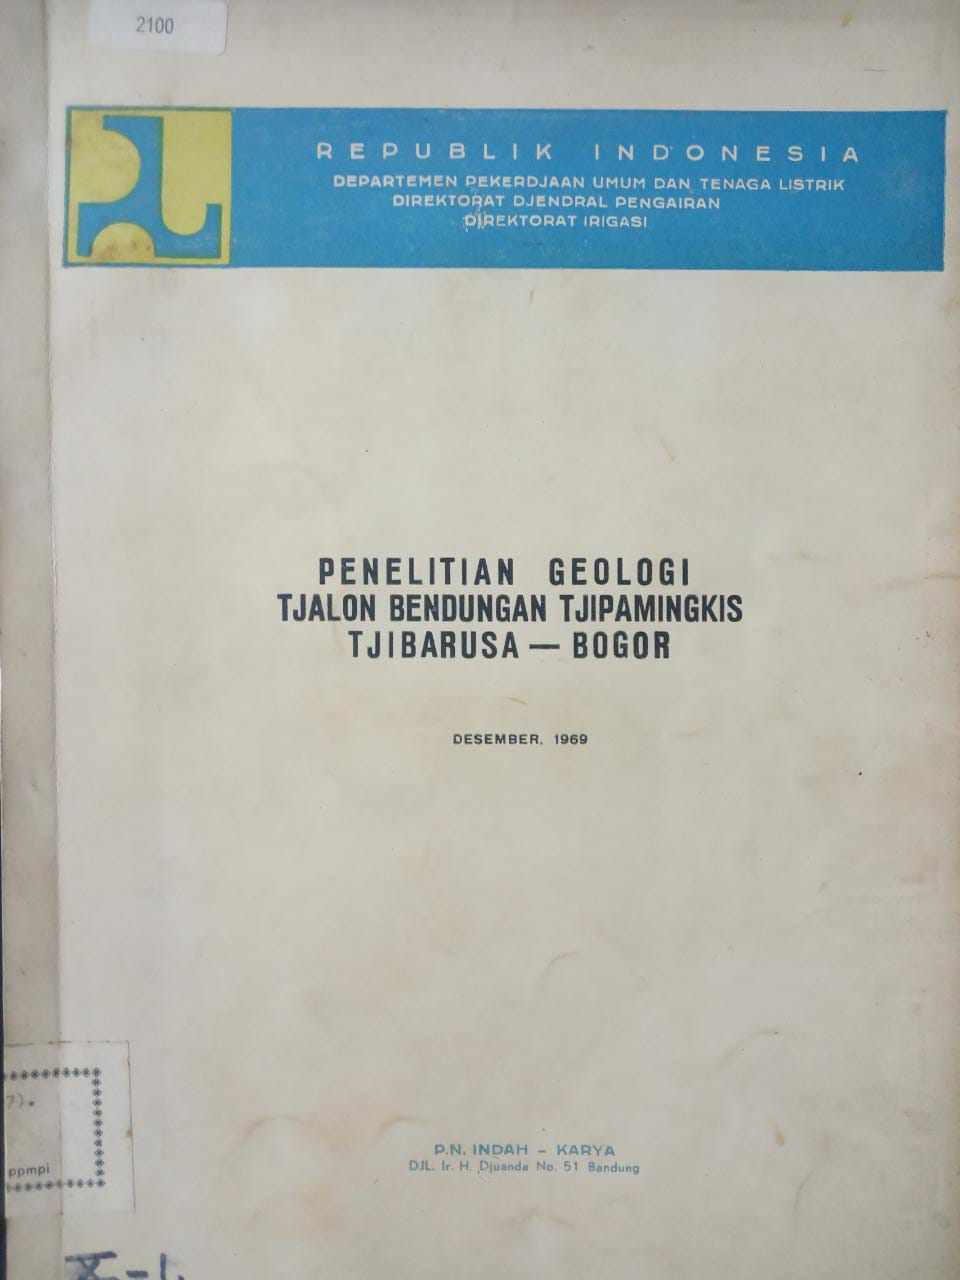 PENELITIAN GEOLOGI TJALON BENDUNGAN TJIPAMINGKIS TJIBARUSA - BOGOR